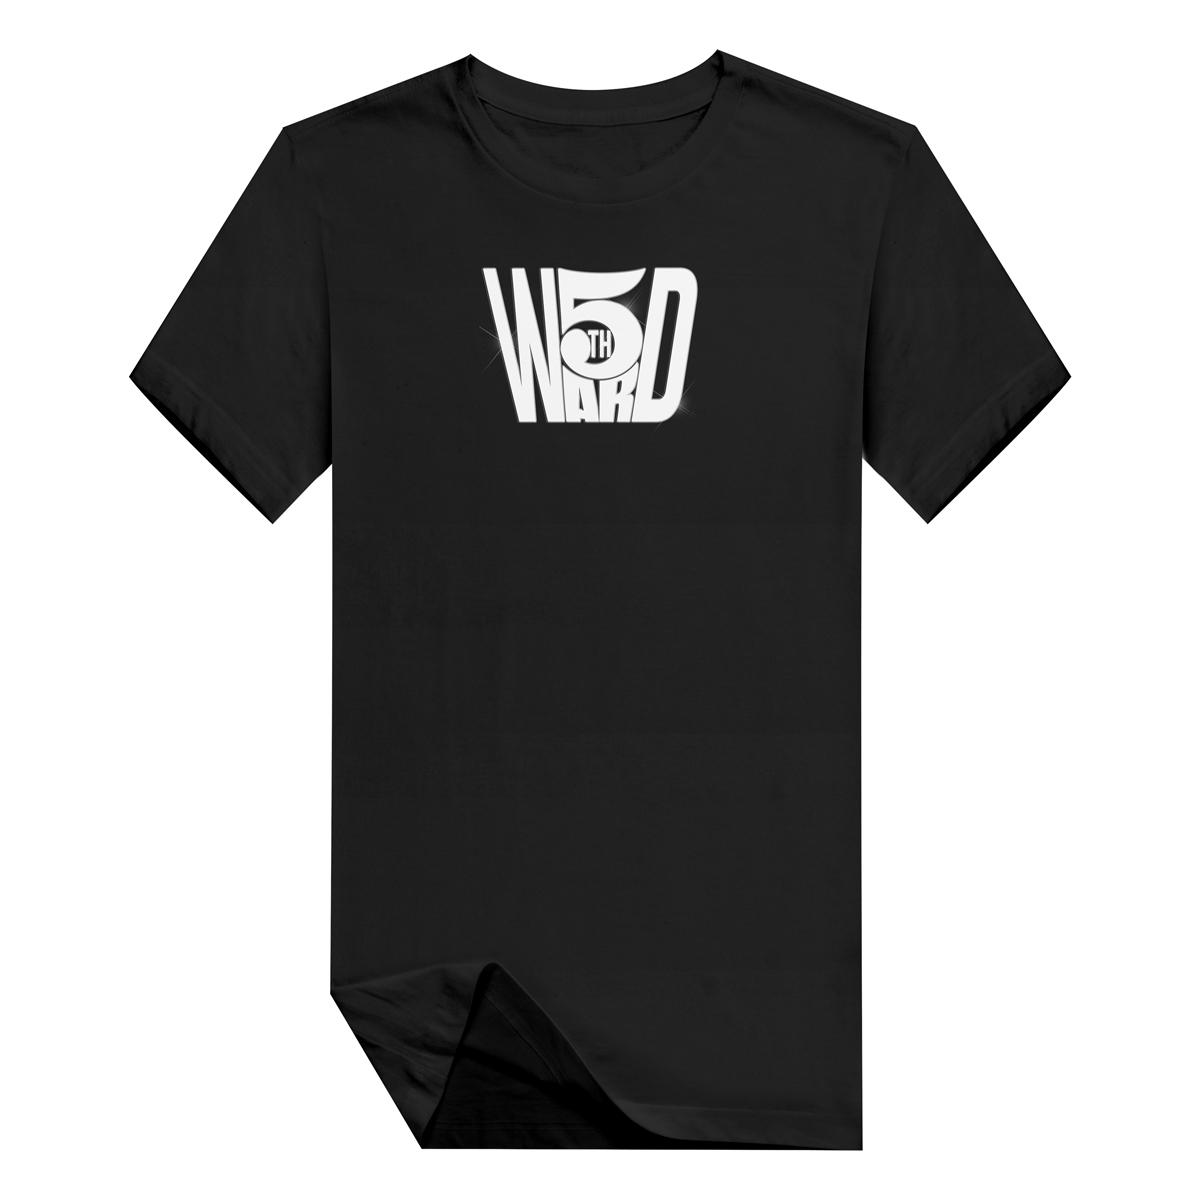 5th Ward Unisex T-Shirt $20.00